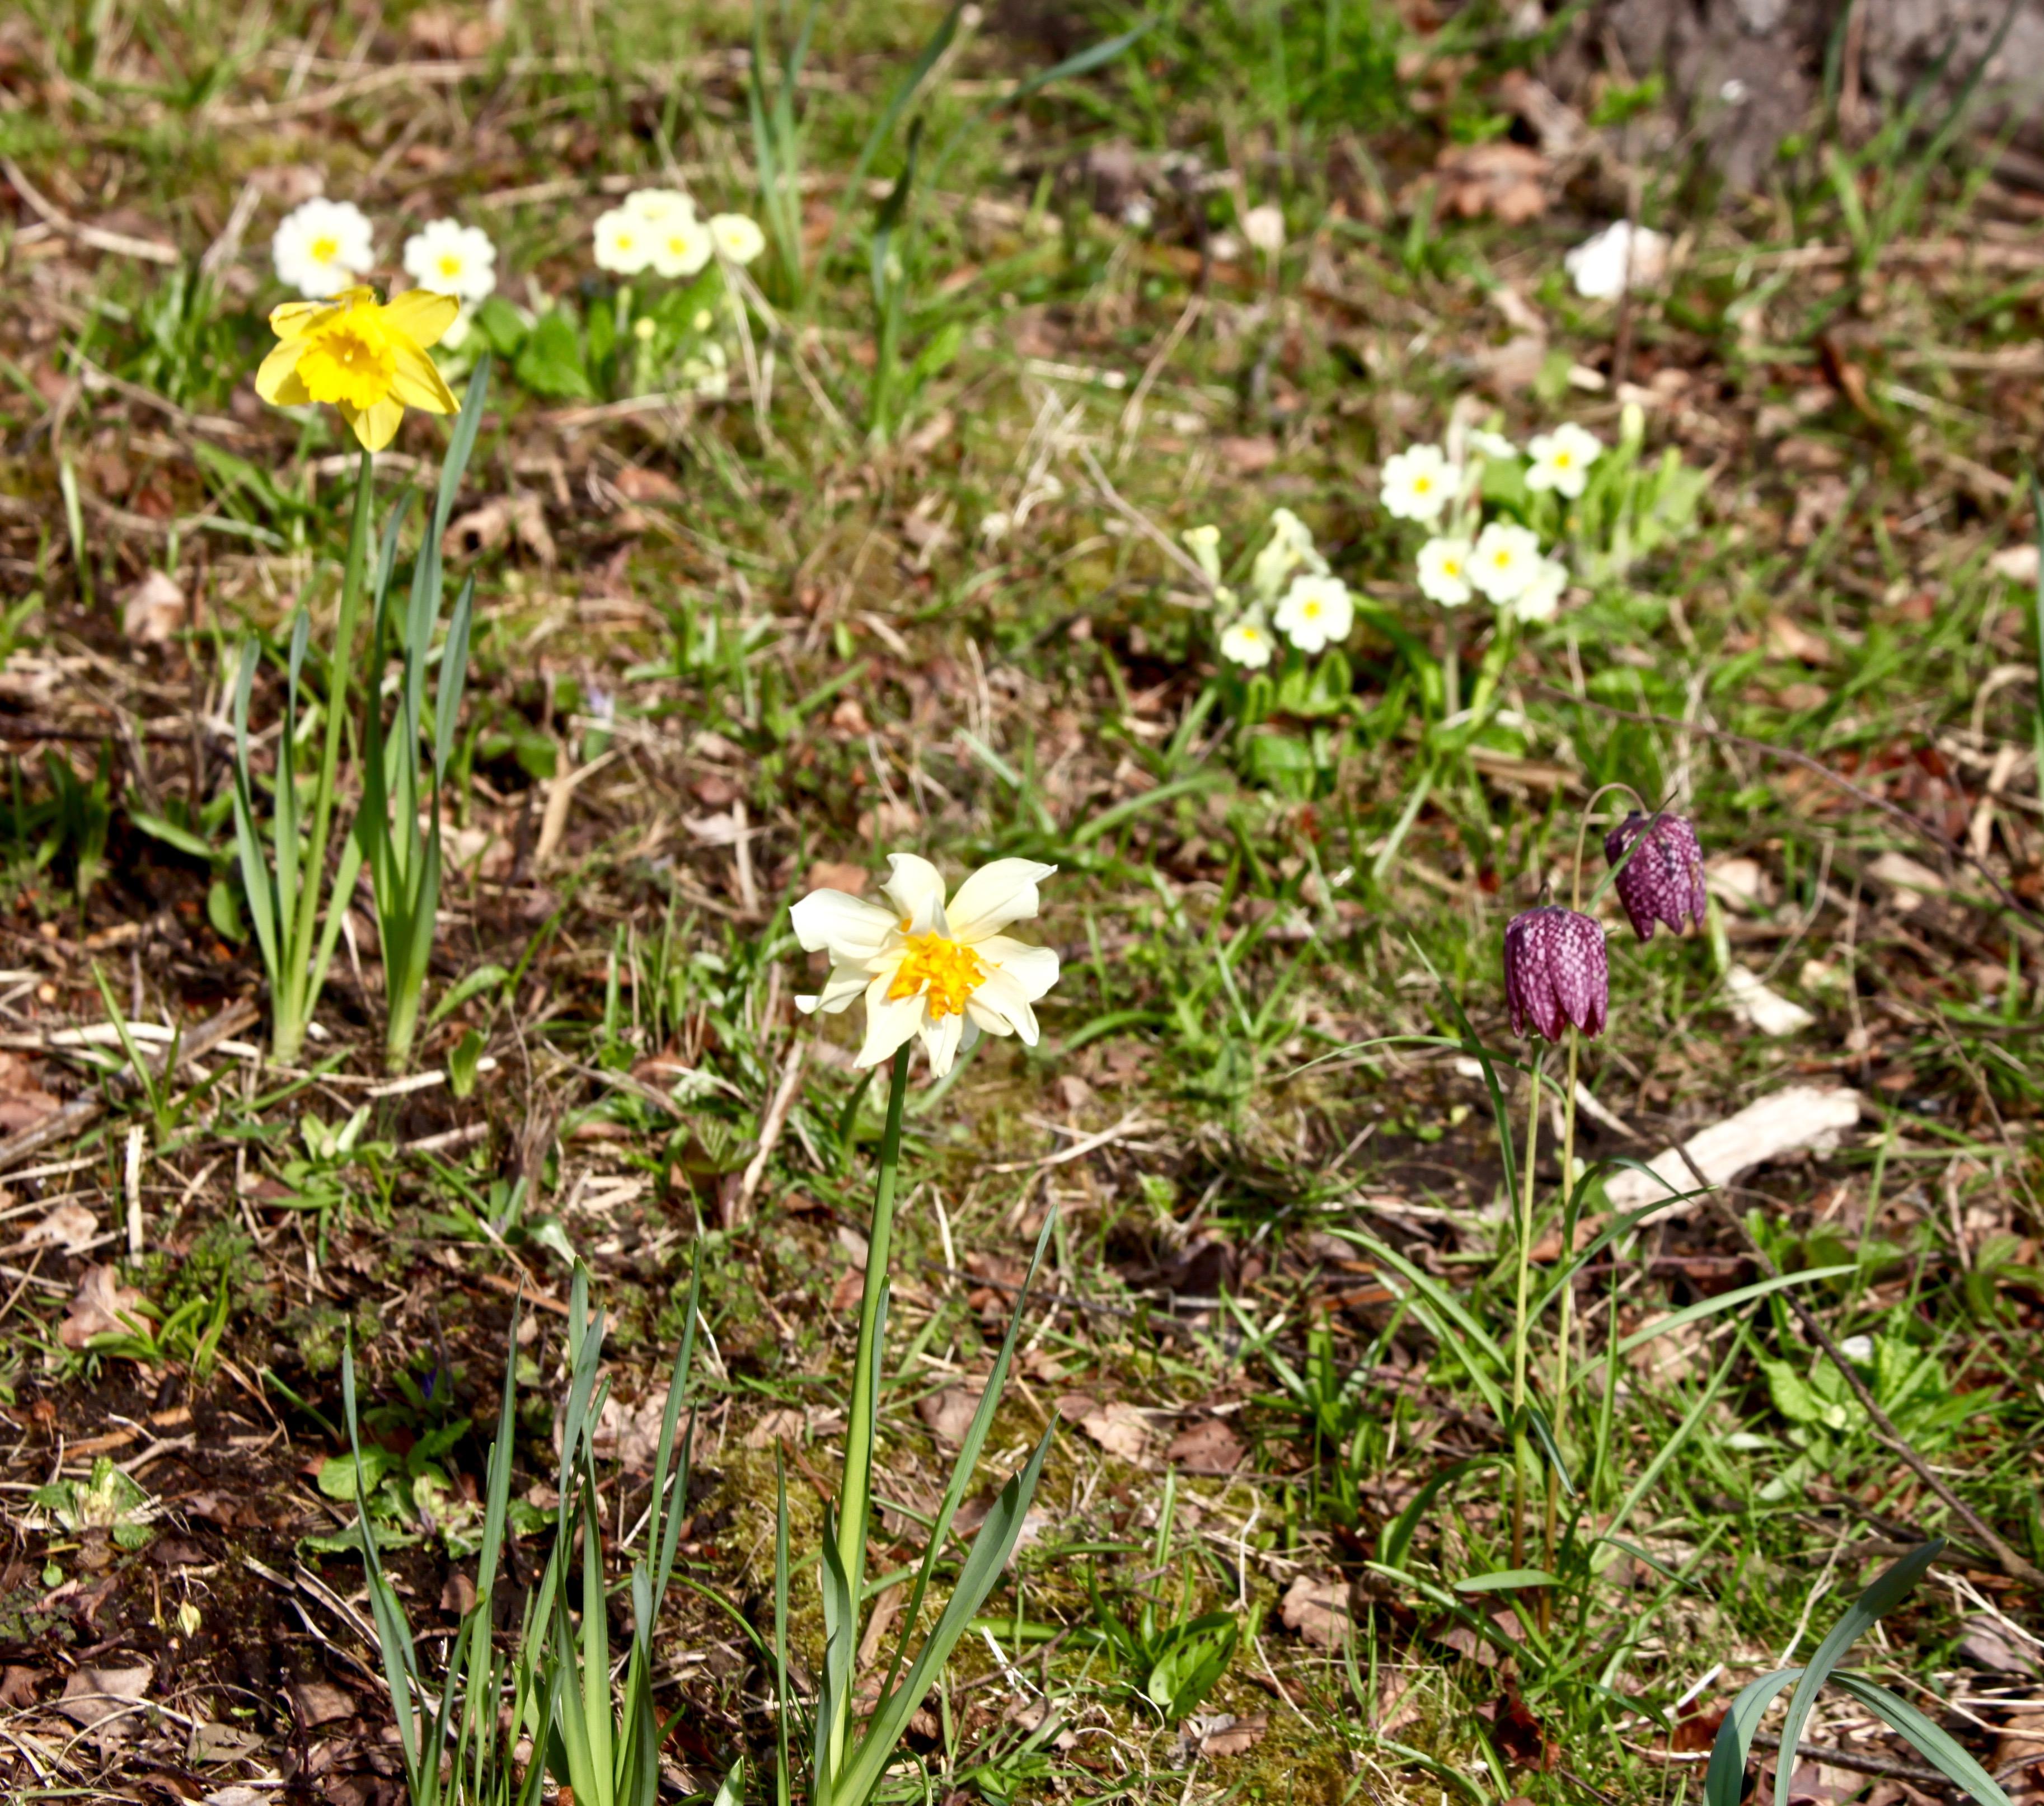 Snake's head fritillaries, daffodils, primroses